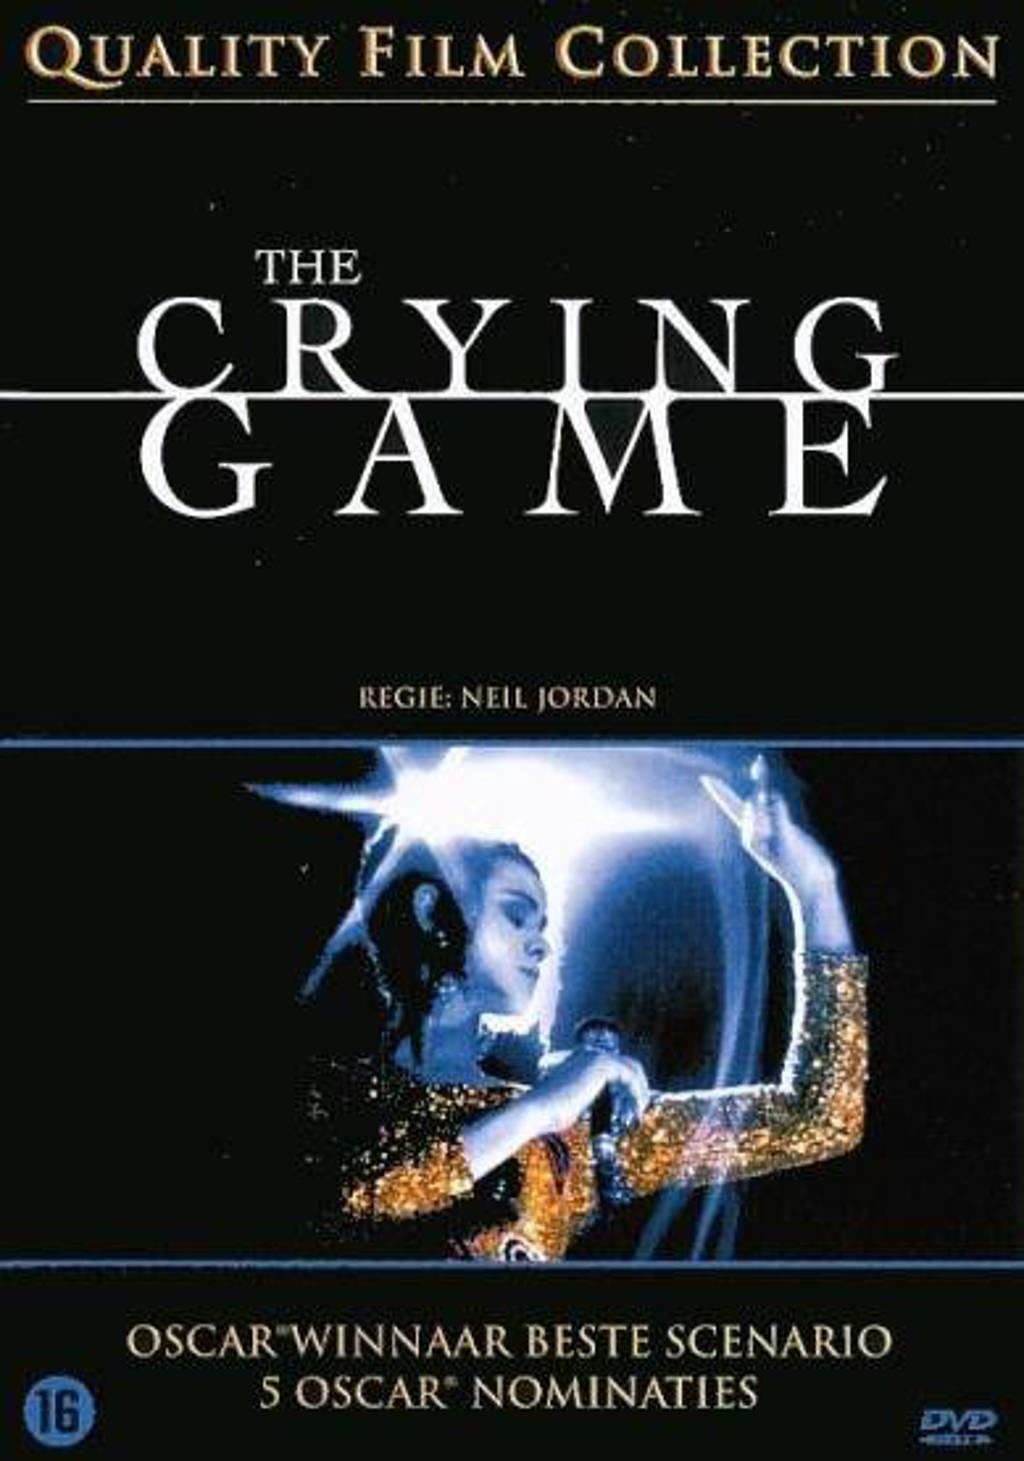 Crying game (DVD)